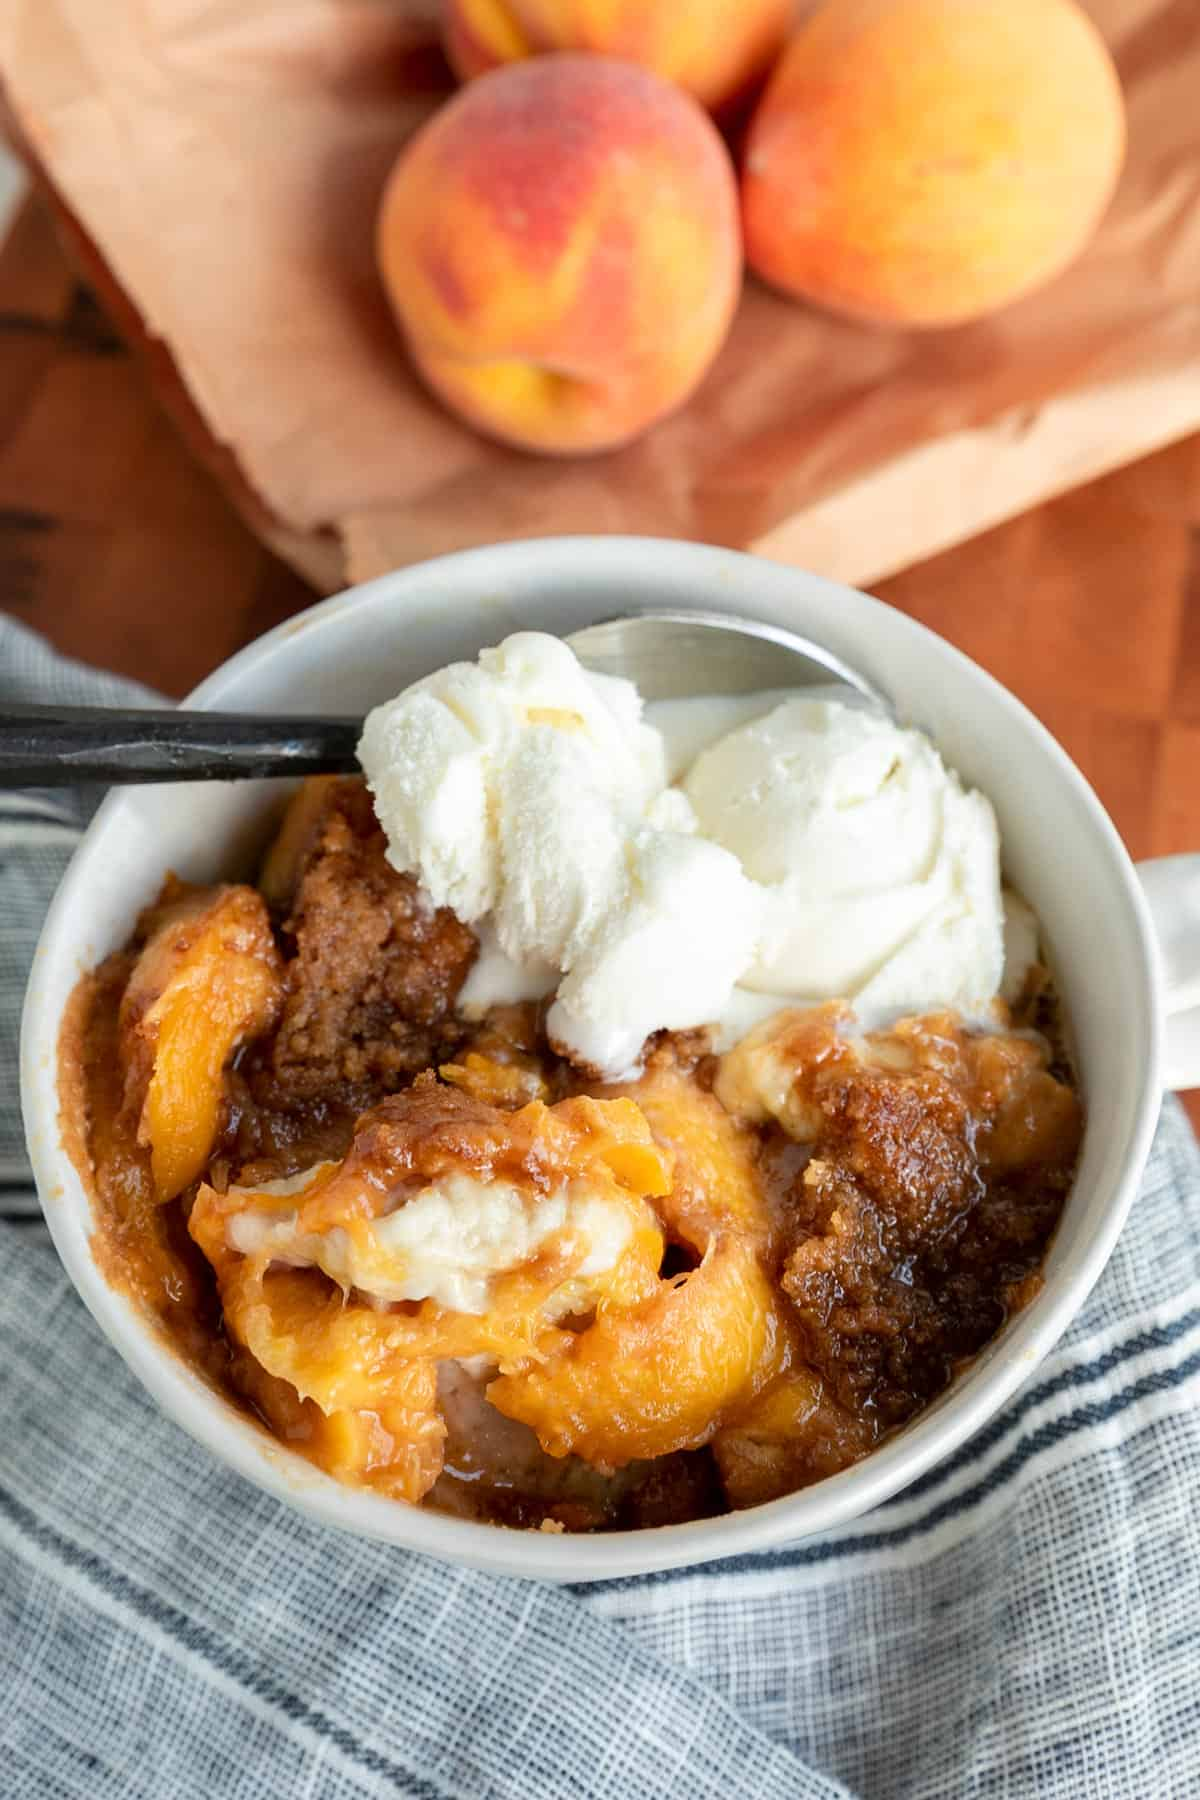 Buttermilk Biscuit Peach Cobbler with vanilla ice cream on top